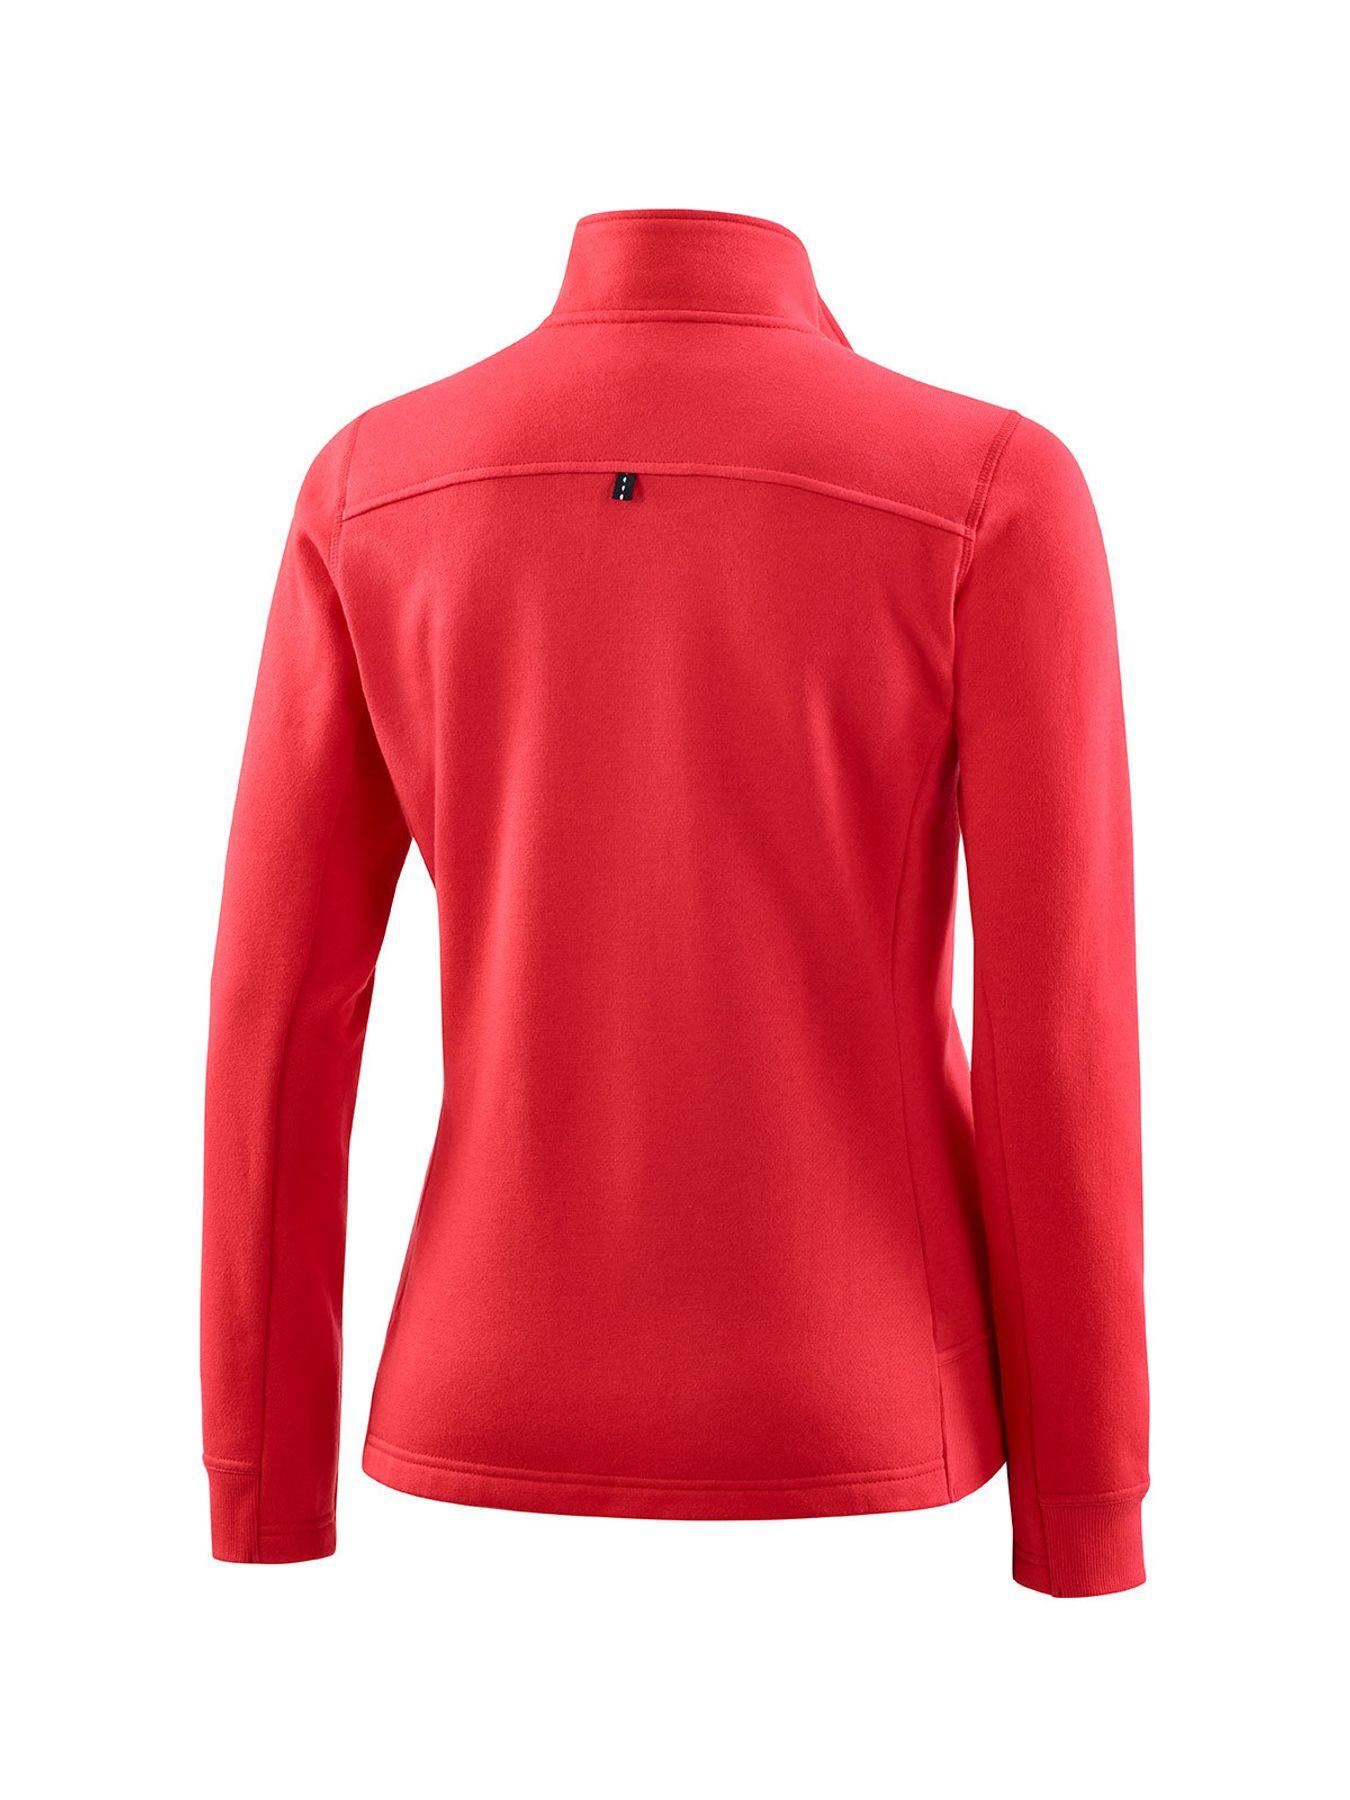 Joy - Damen Sport und Freizeit Jacke in mehreren Farben, Paulina (34500) – Bild 10